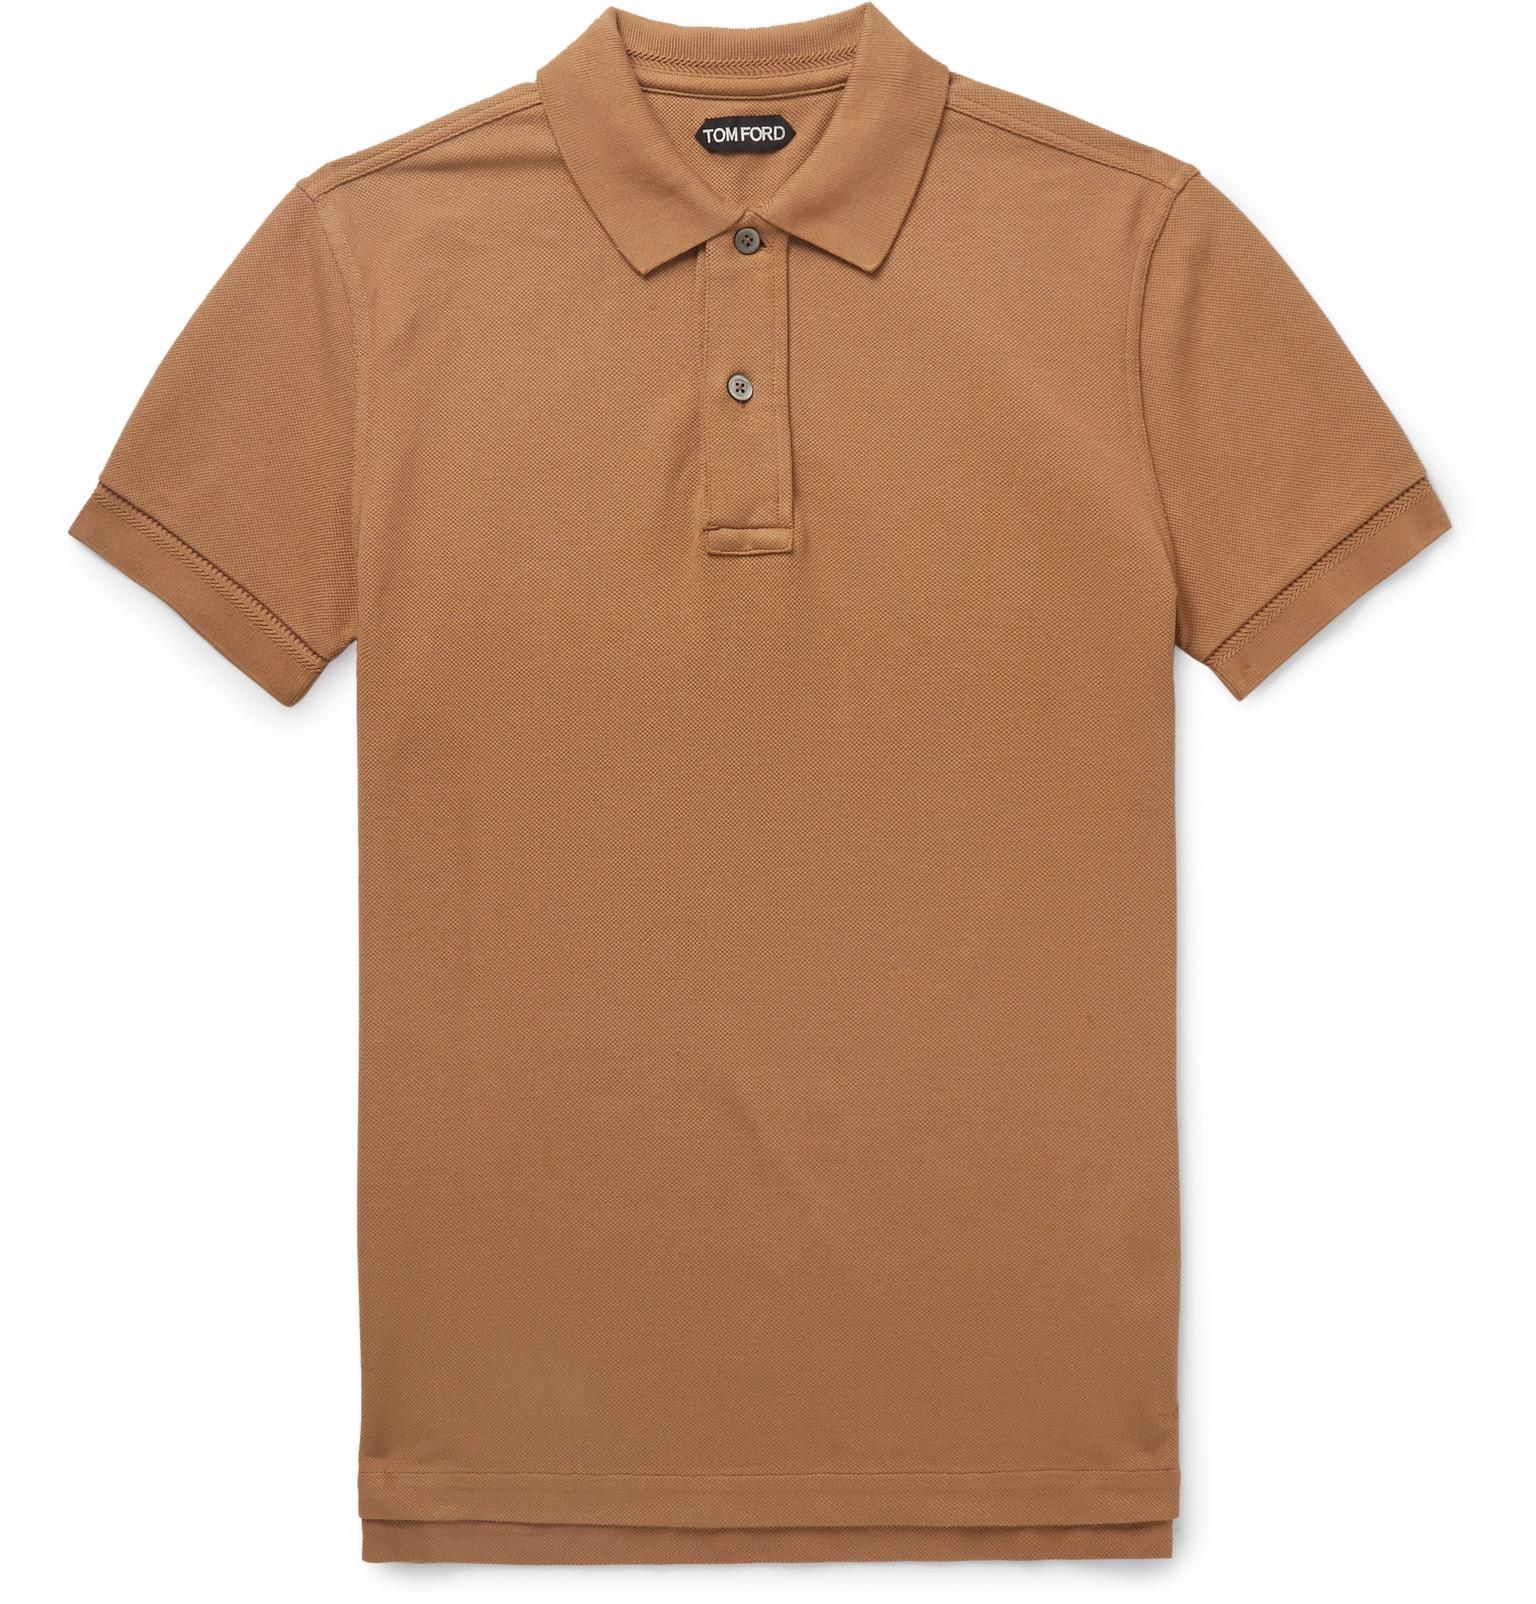 0c6b79a0 Tom Ford - Brown Garment-dyed Cotton-piqué Polo Shirt for Men - Lyst. View  fullscreen